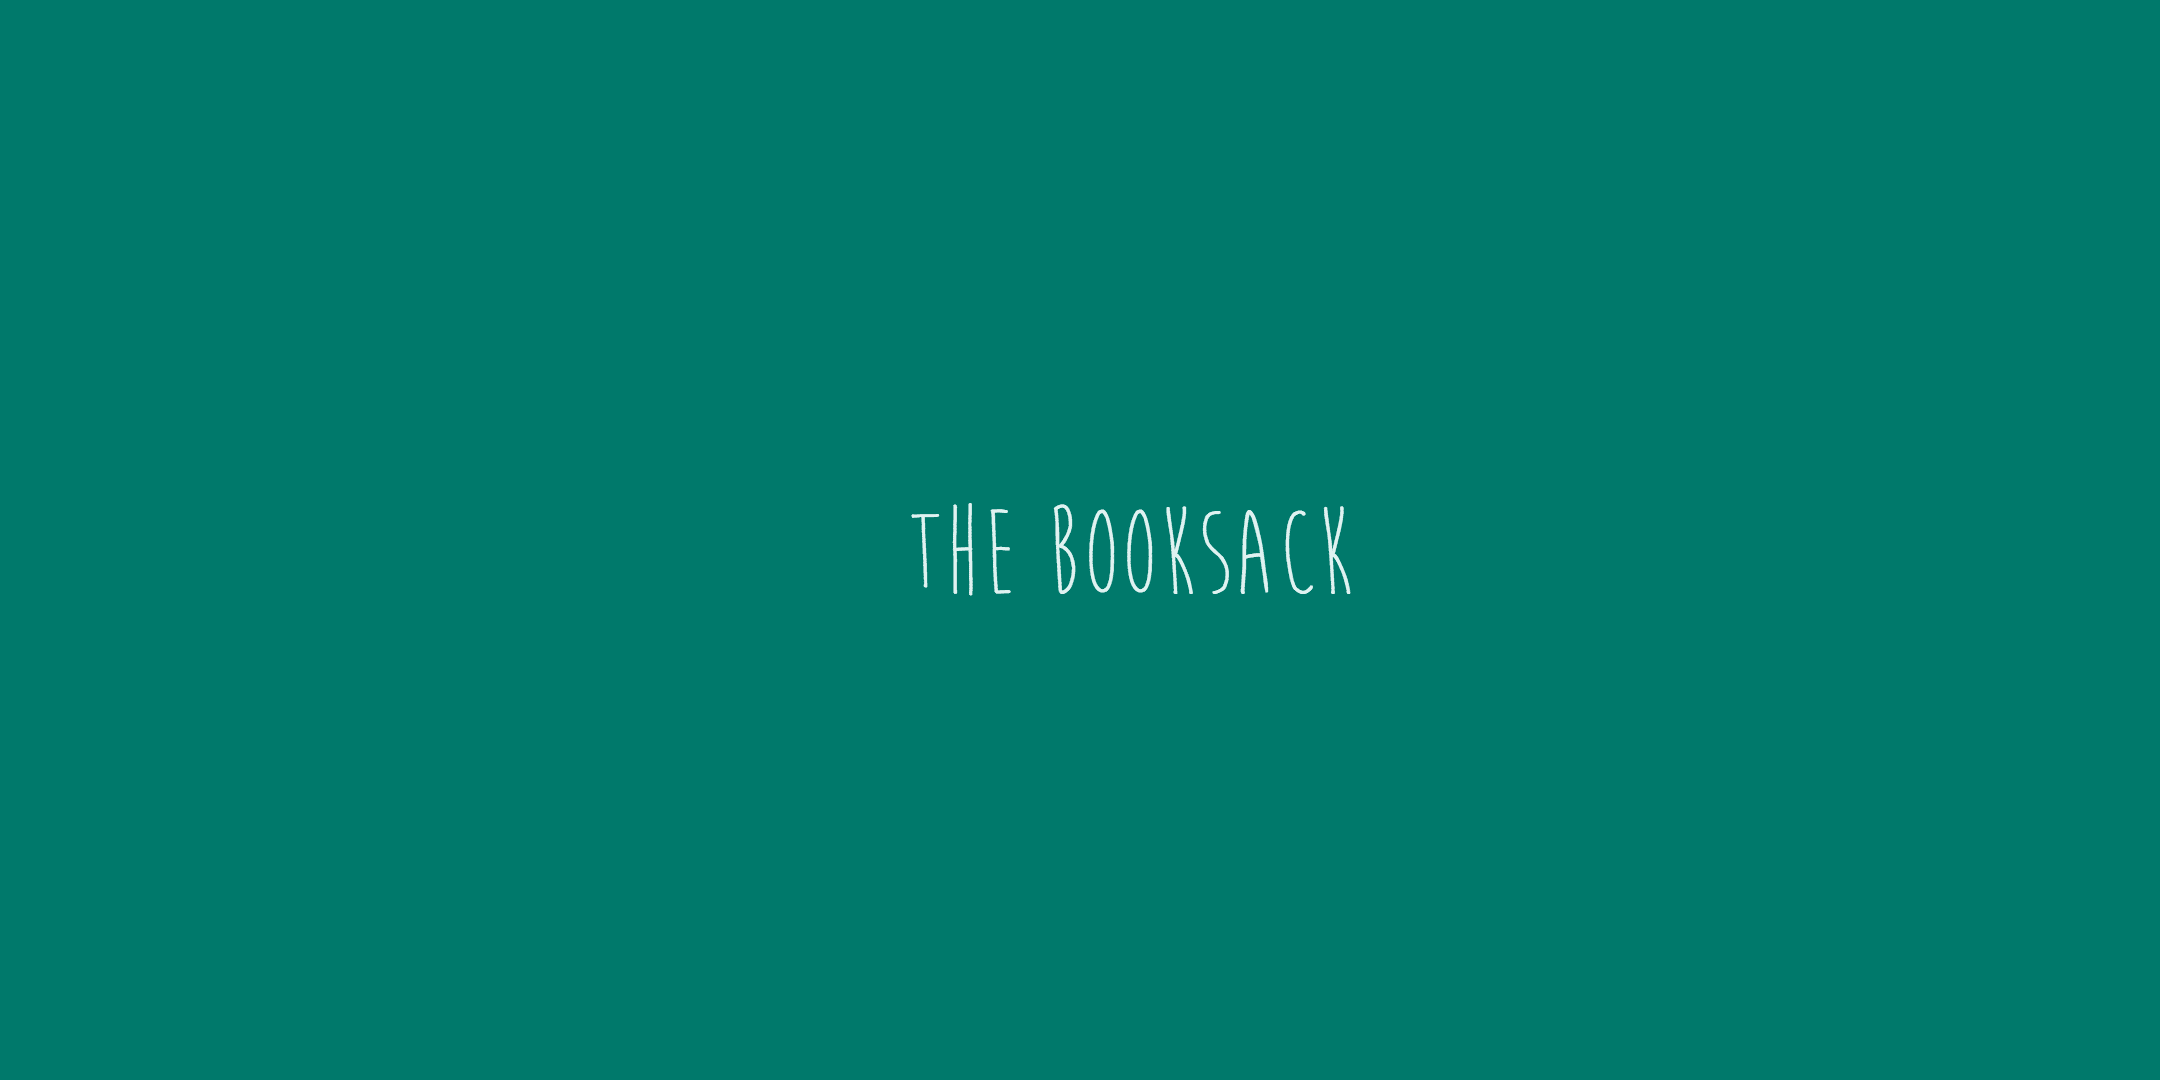 Green,                Blue,                Text,                Aqua,                Font,                Teal,                Turquoise,                Product,                Line,                Logo,                Black,                 Free Image